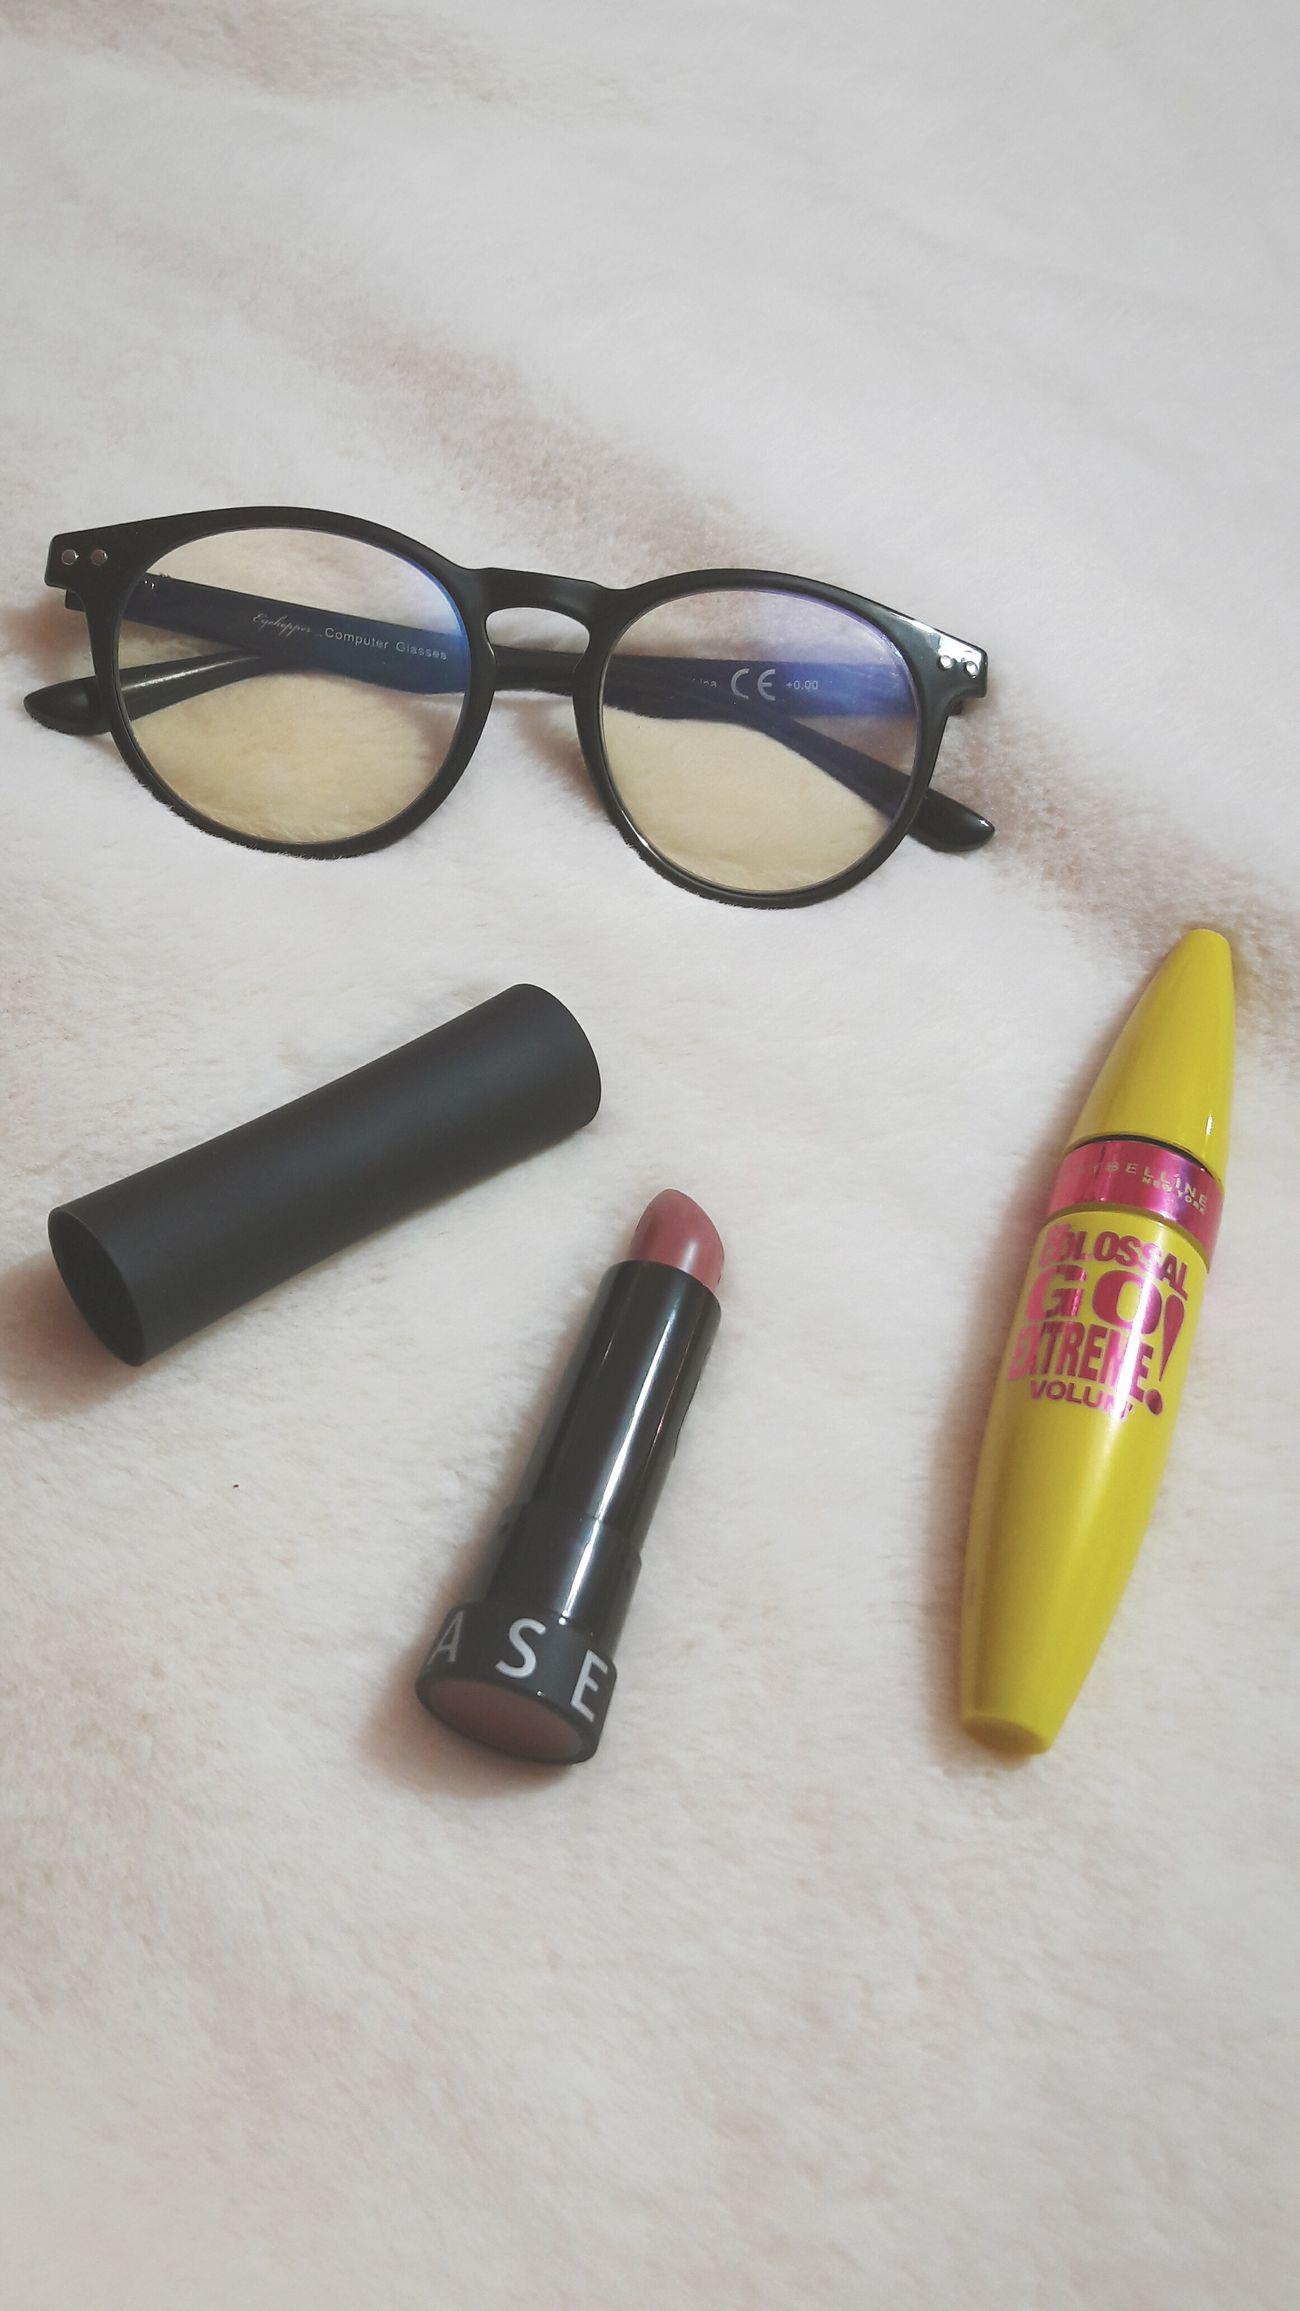 Makeup ❣💄 Studio Shot Equipment No People Close-up Work Tool White Background Indoors  Makeup Makeupartist Lipstick Glasses Cover Eyes Eyeliner